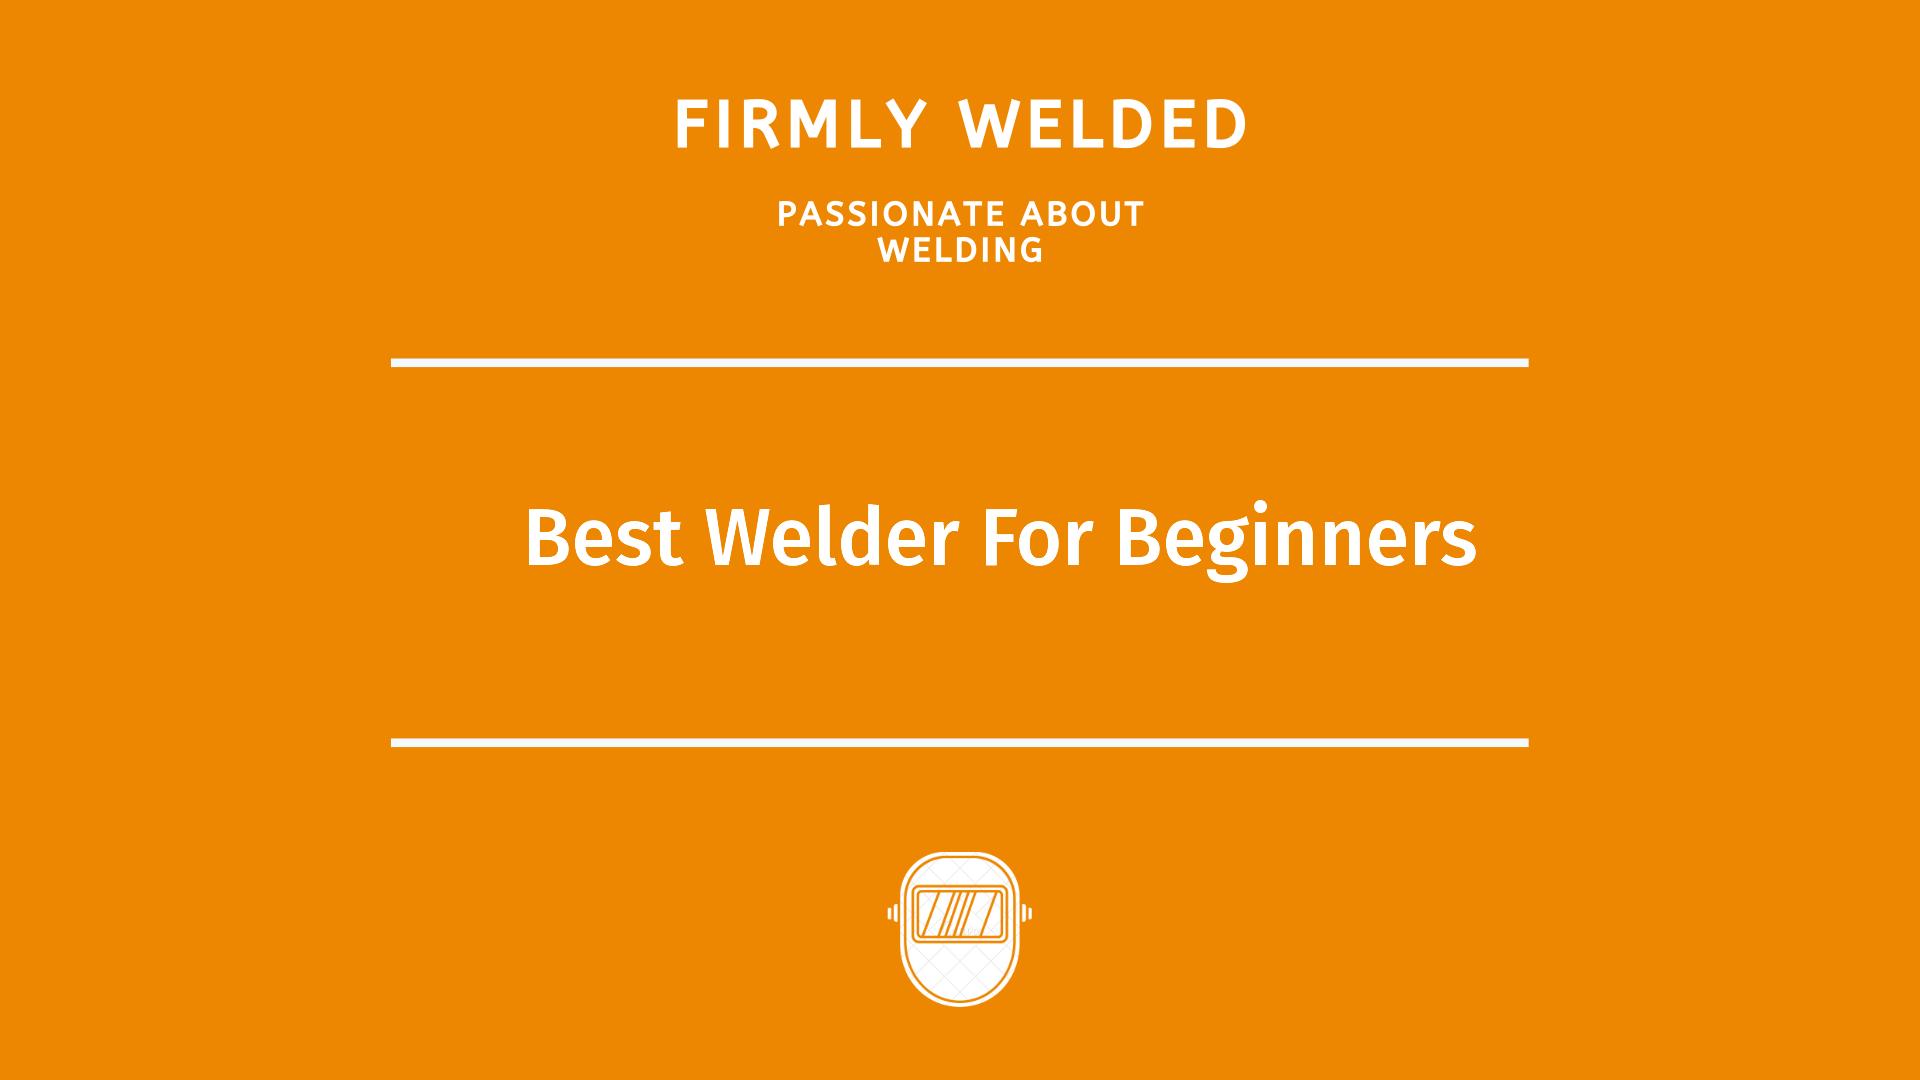 Best Welder For Beginners